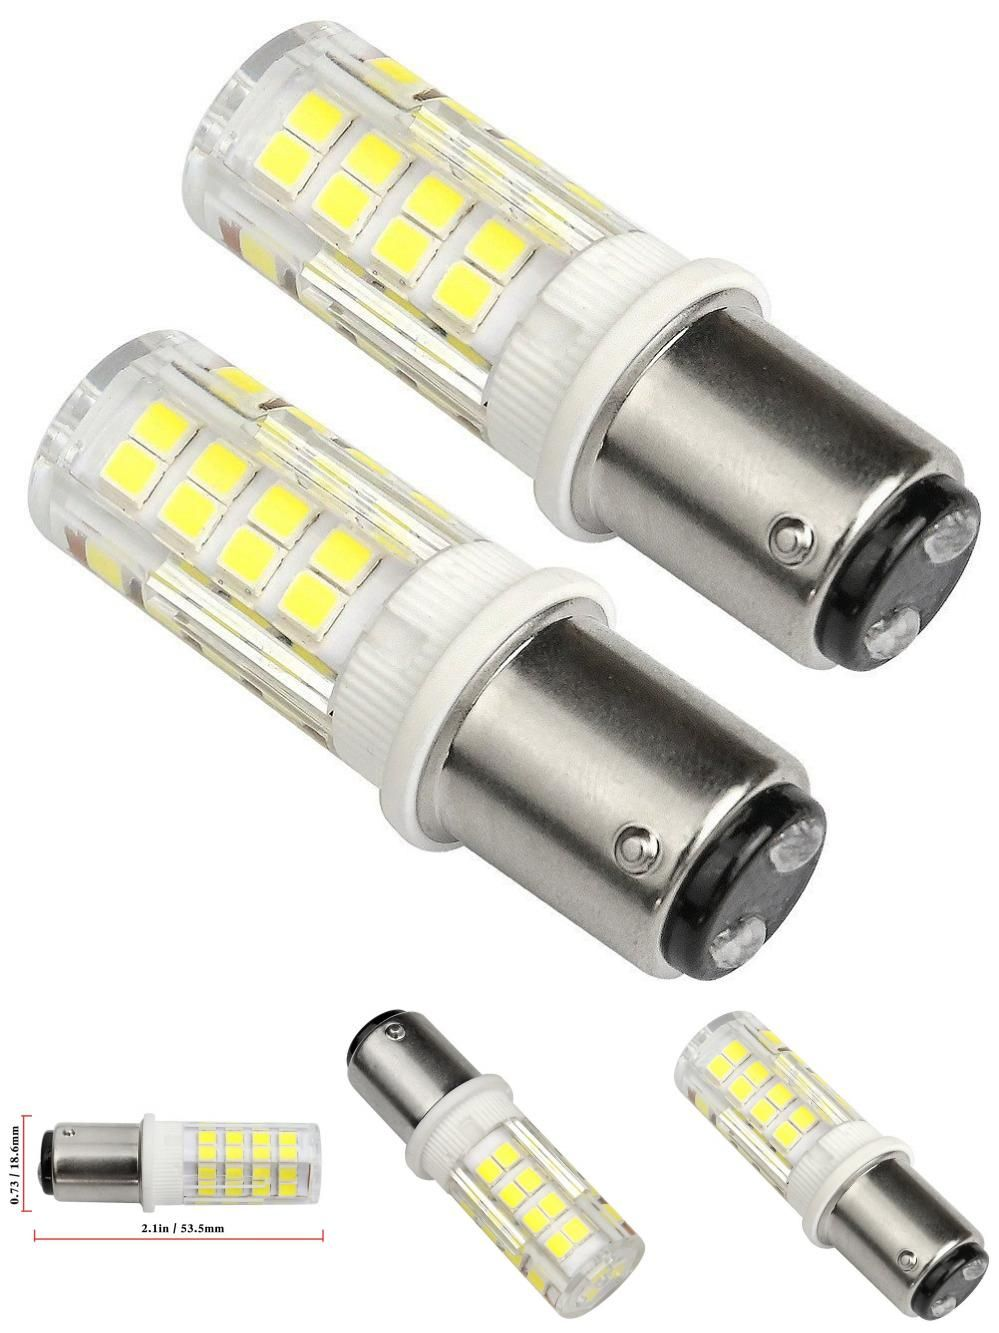 Visit To Buy Ba15d Led Bulb 220v 4w Equivalent 40w Halogen Lamp Daylight White 6000k Led Lamp Double Bayonet Sewing Mach Halogen Lamp Led Bulb Led Light Bulb